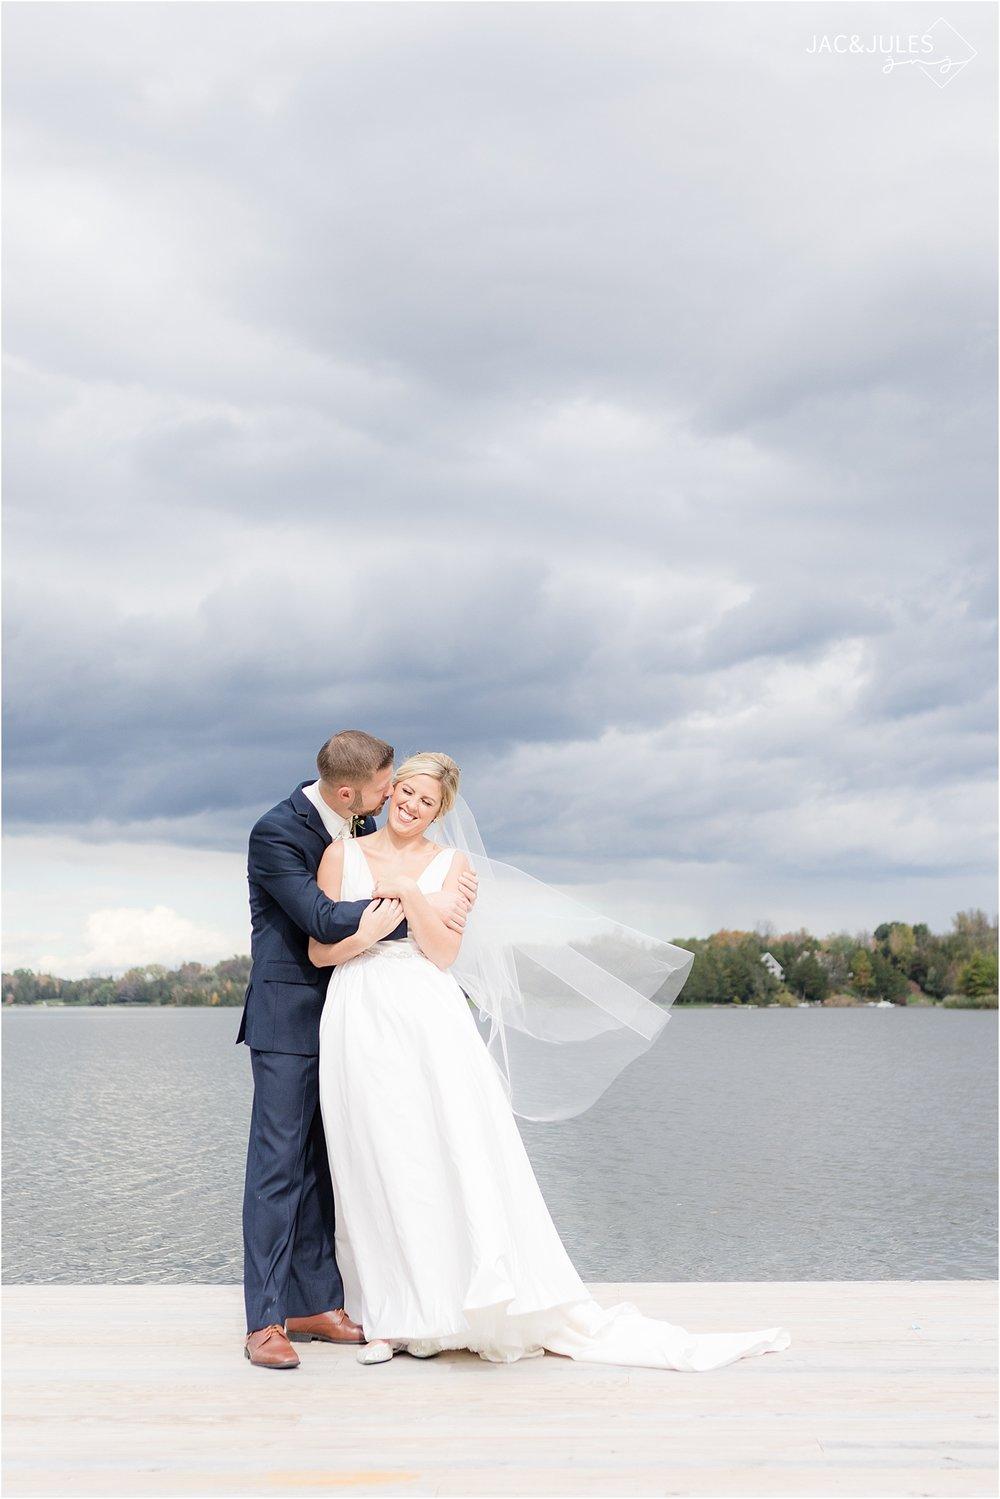 Germantown NY wedding photo